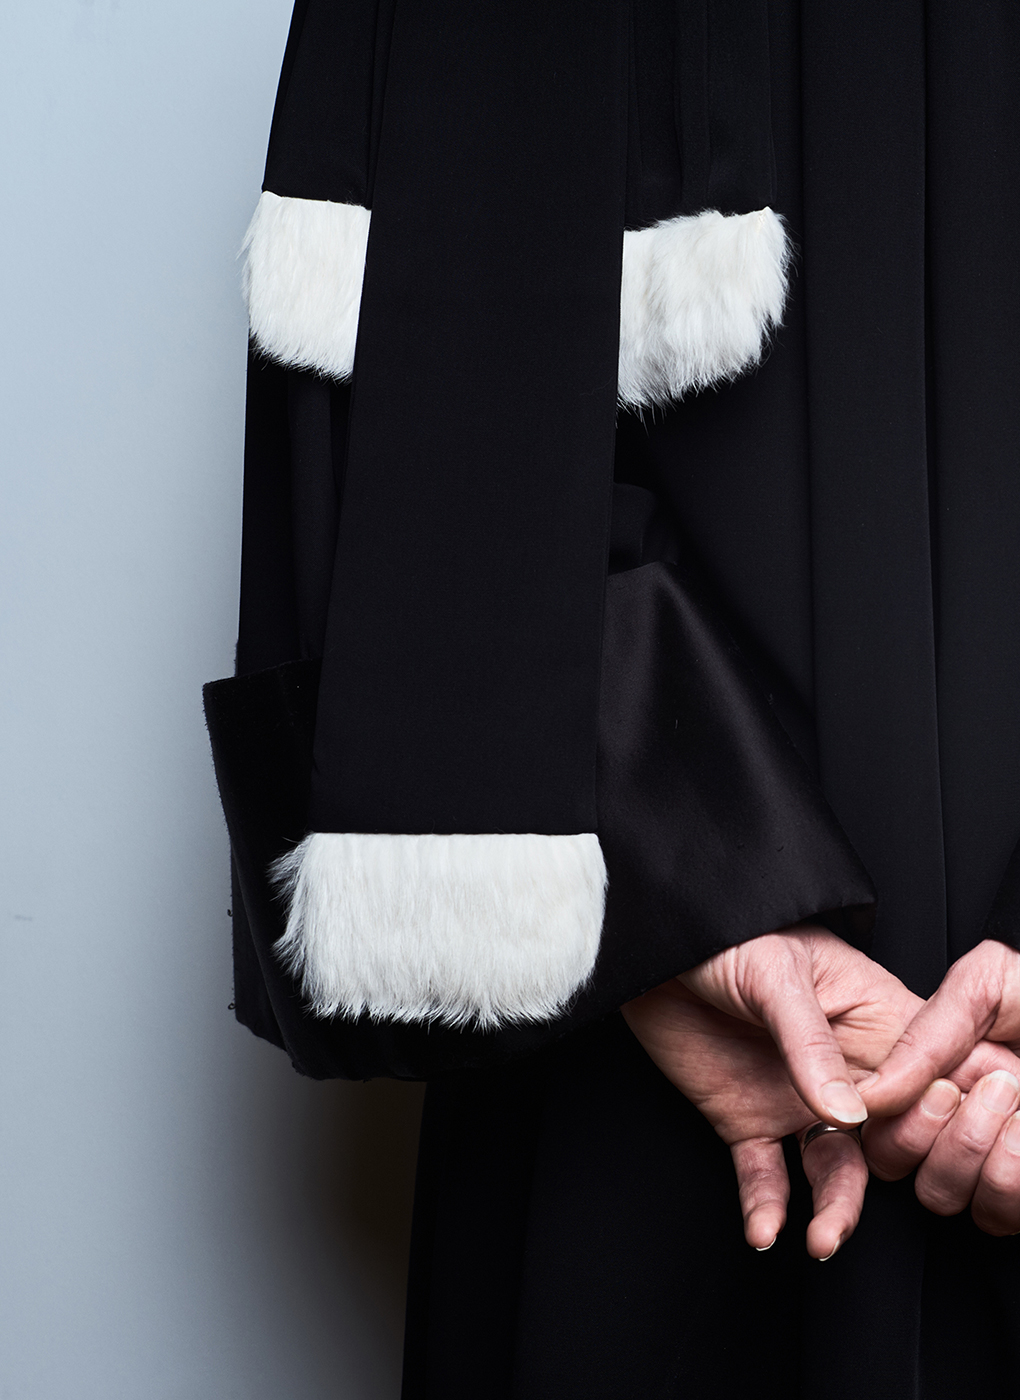 hv_avocat-ys_030_resize